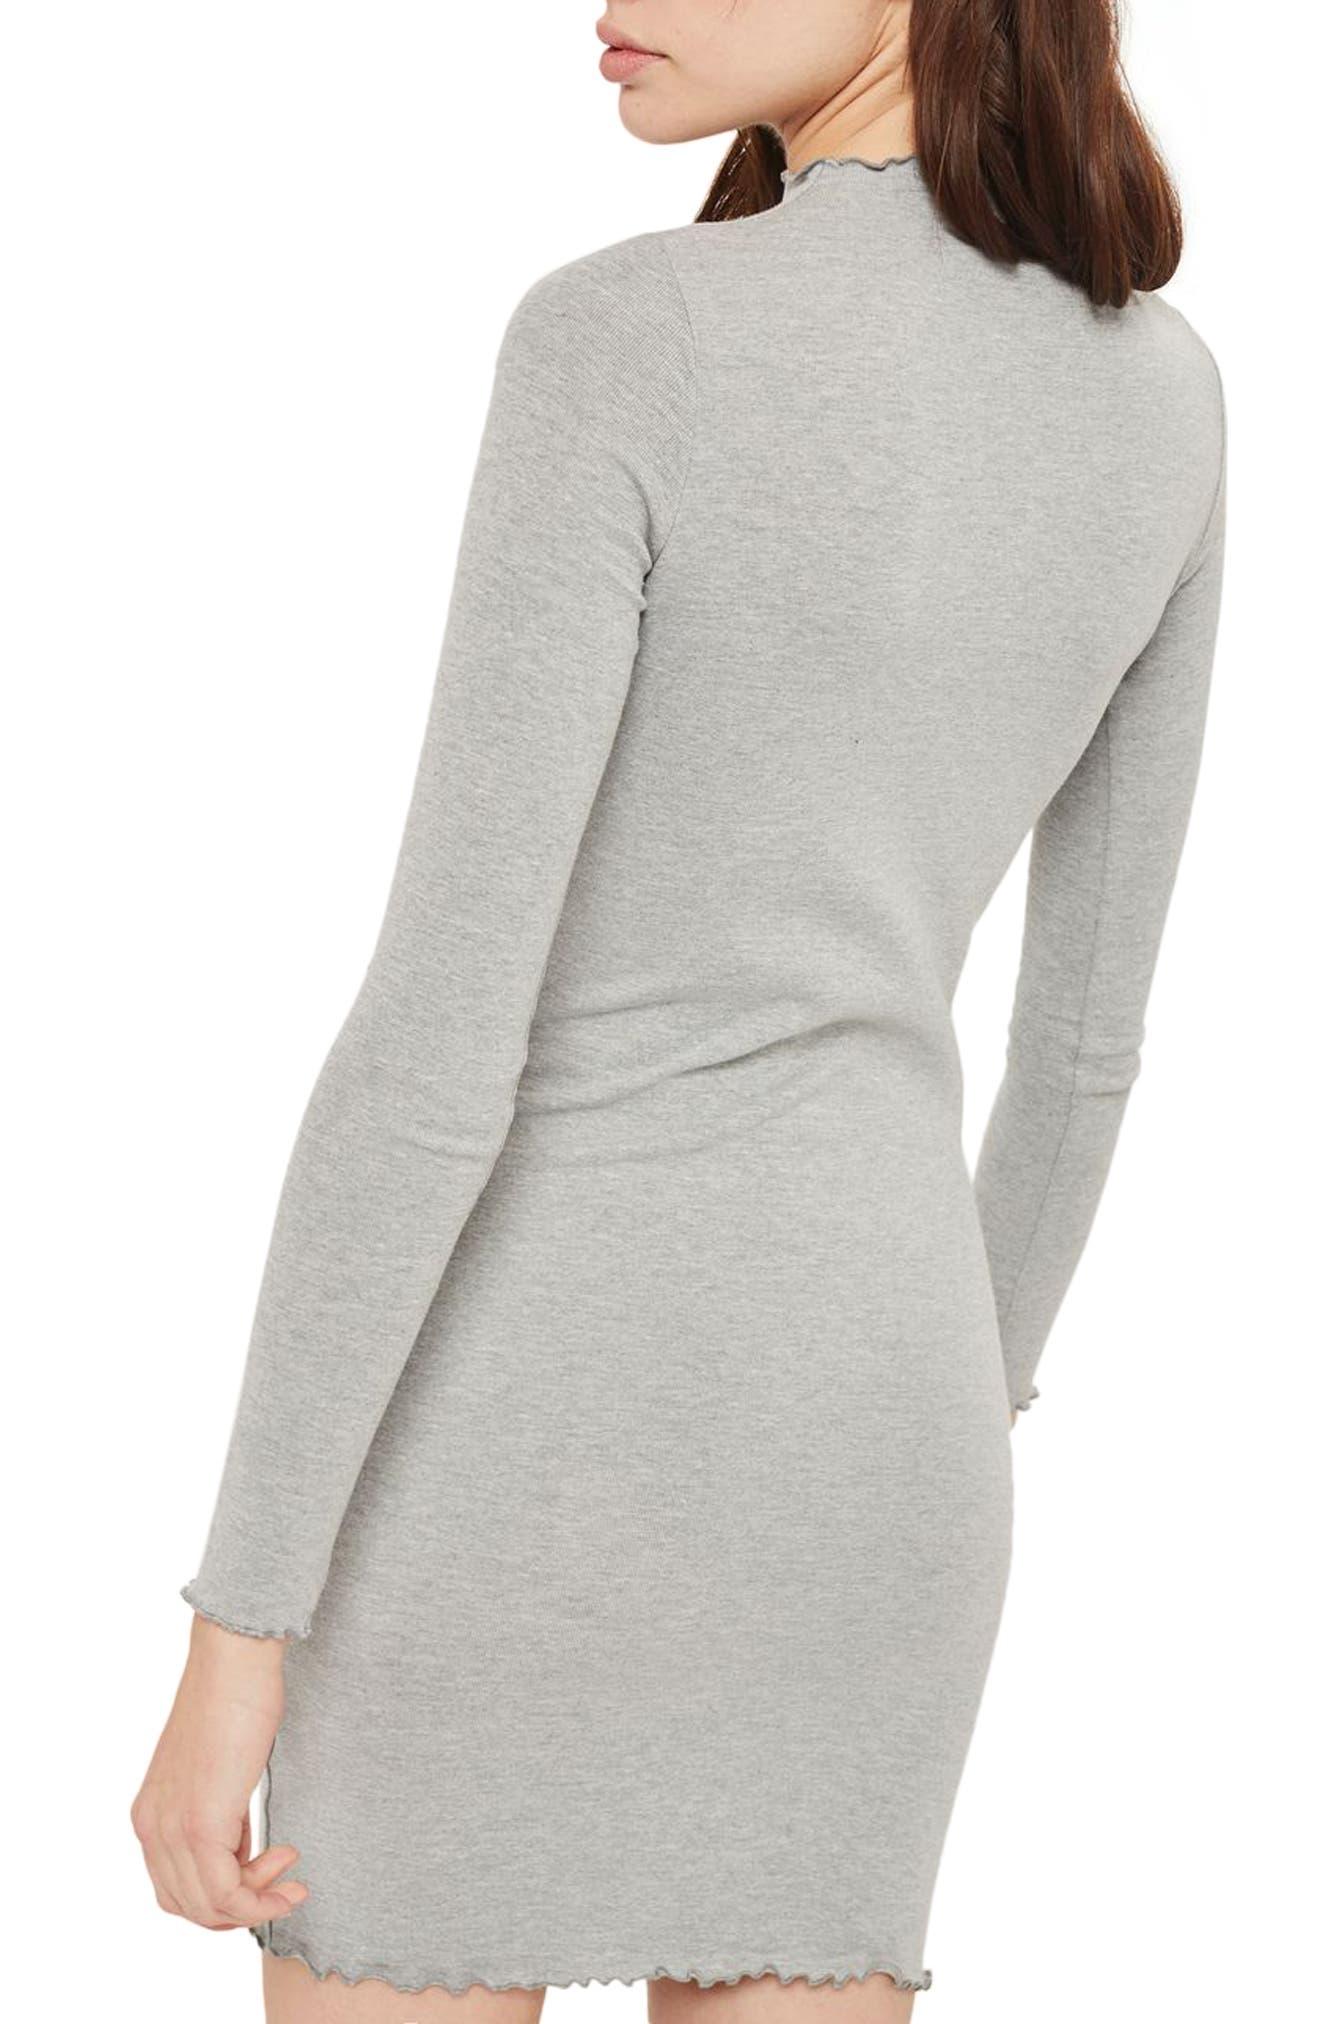 Lettuce Edge Body-Con Dress,                             Alternate thumbnail 2, color,                             Grey